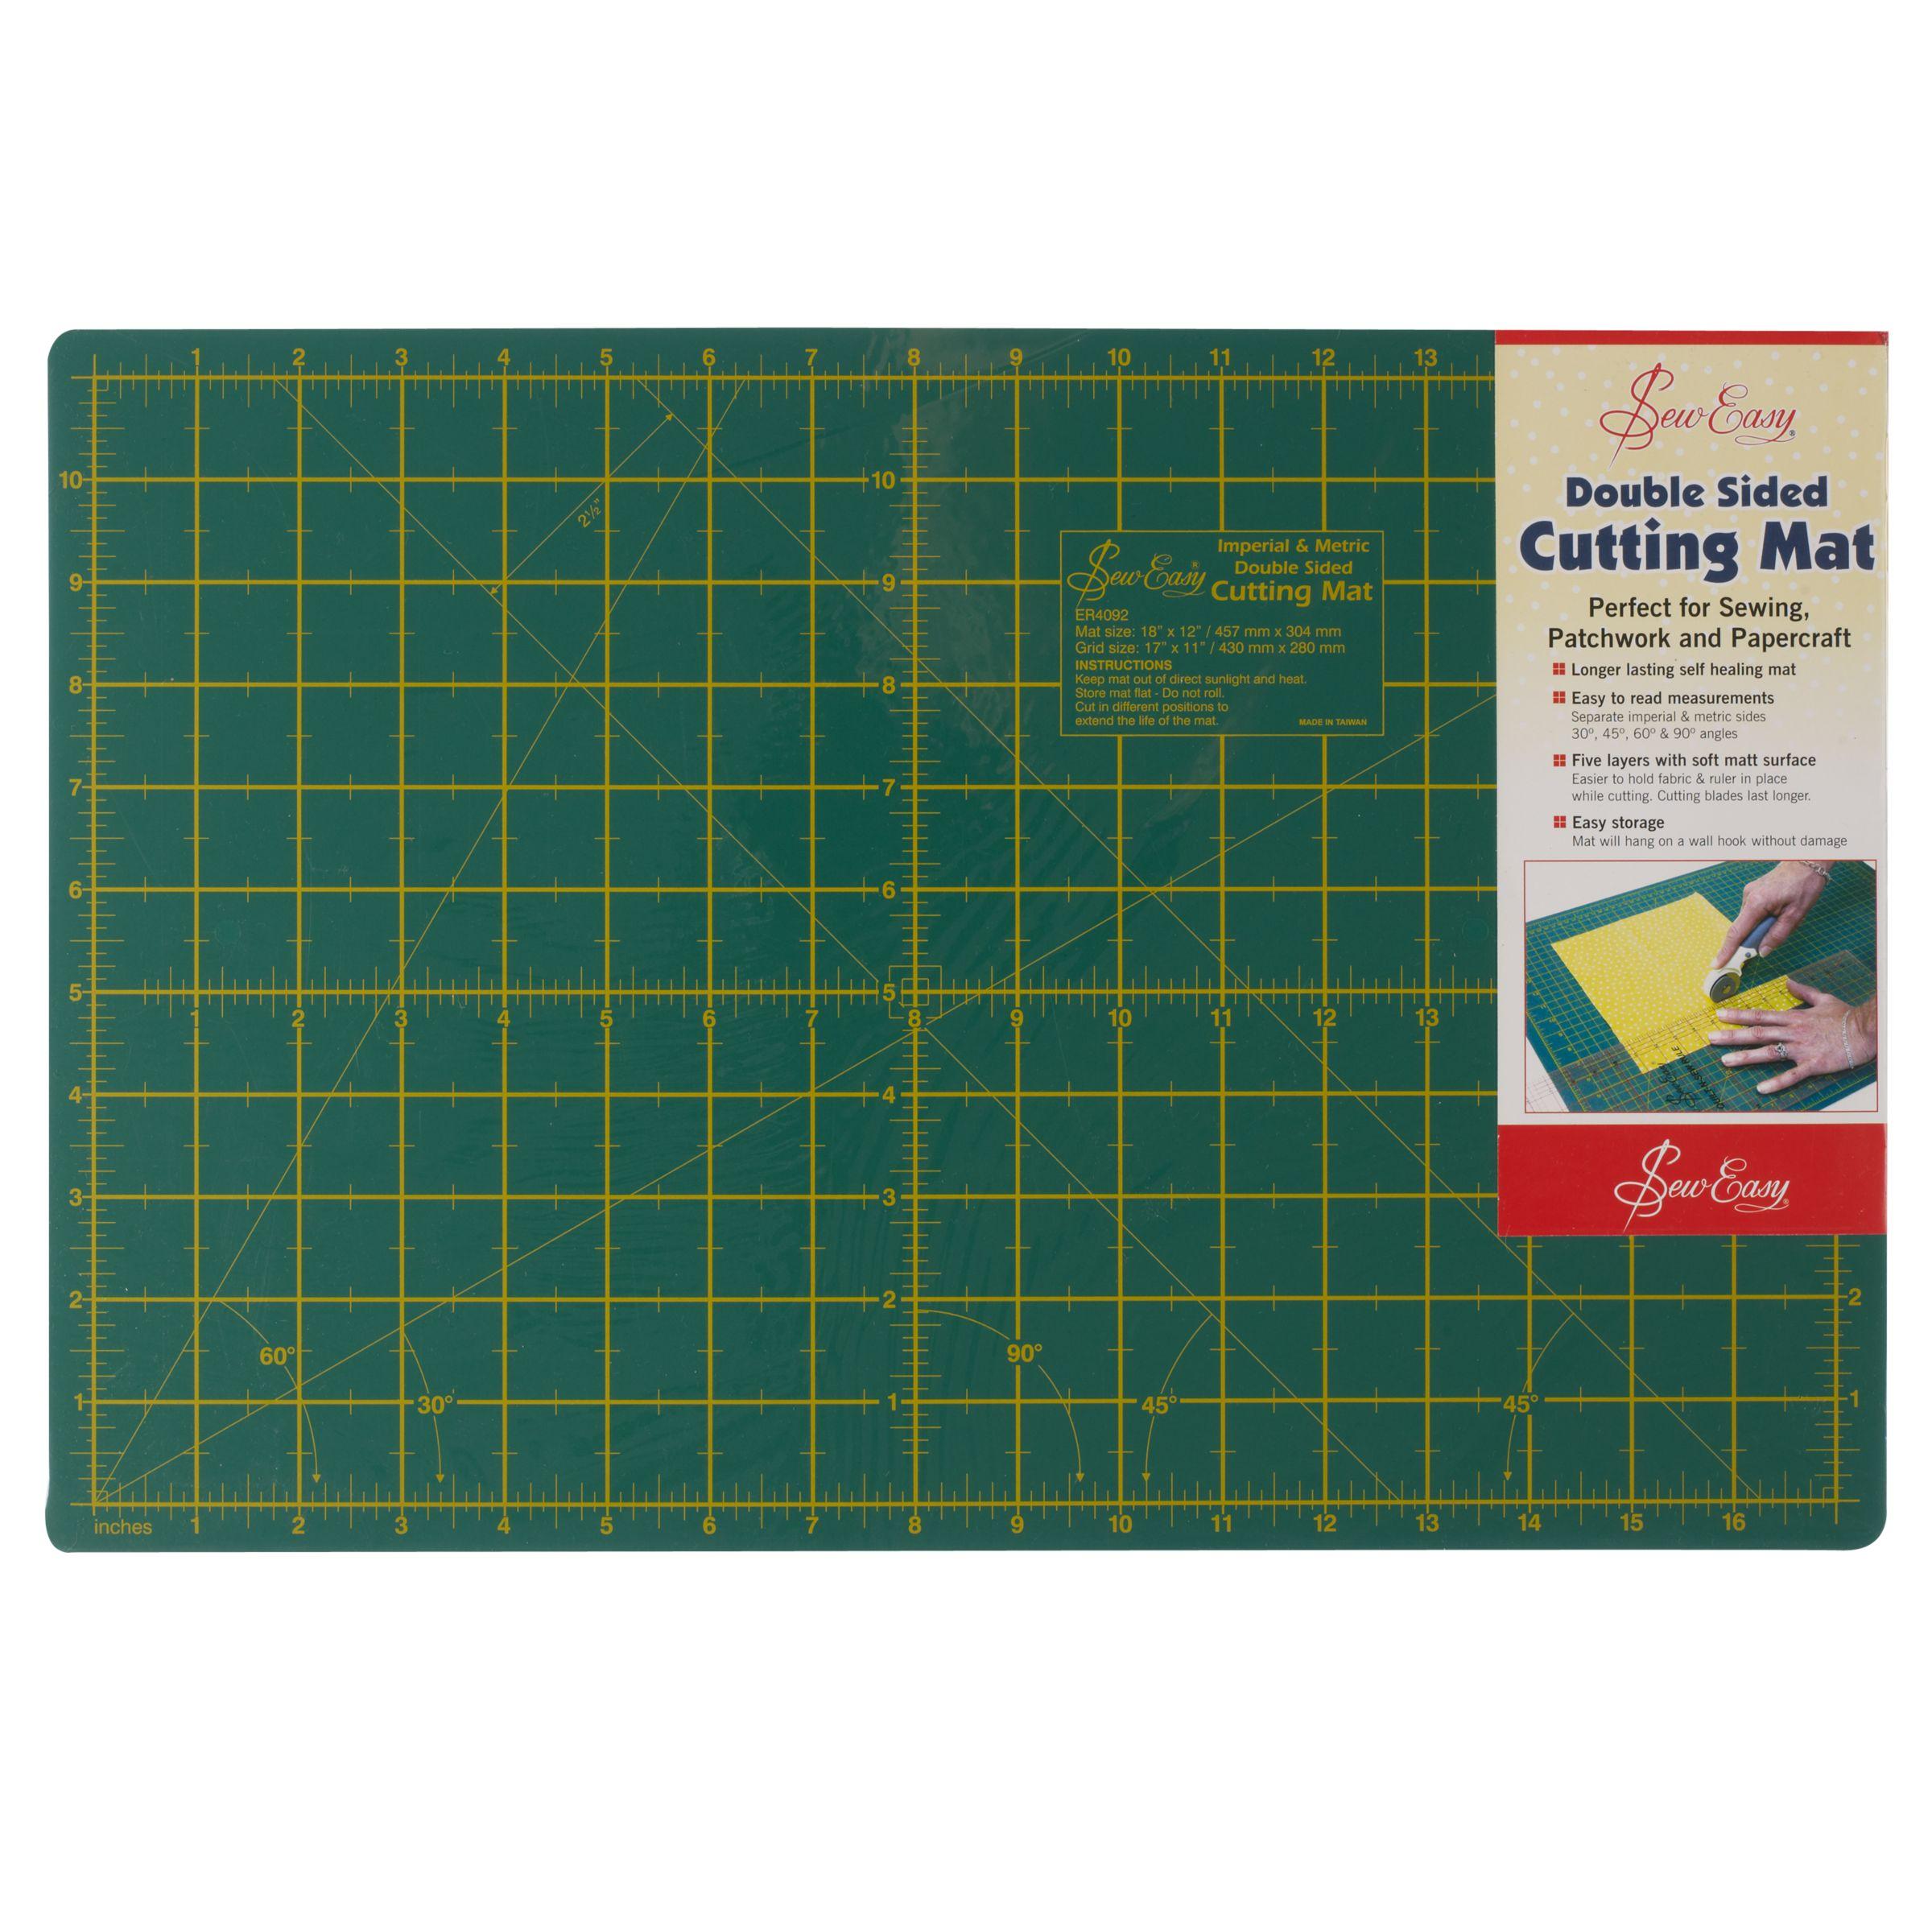 Sew Easy Sew Easy Cutting Mat, 45 x 30cm